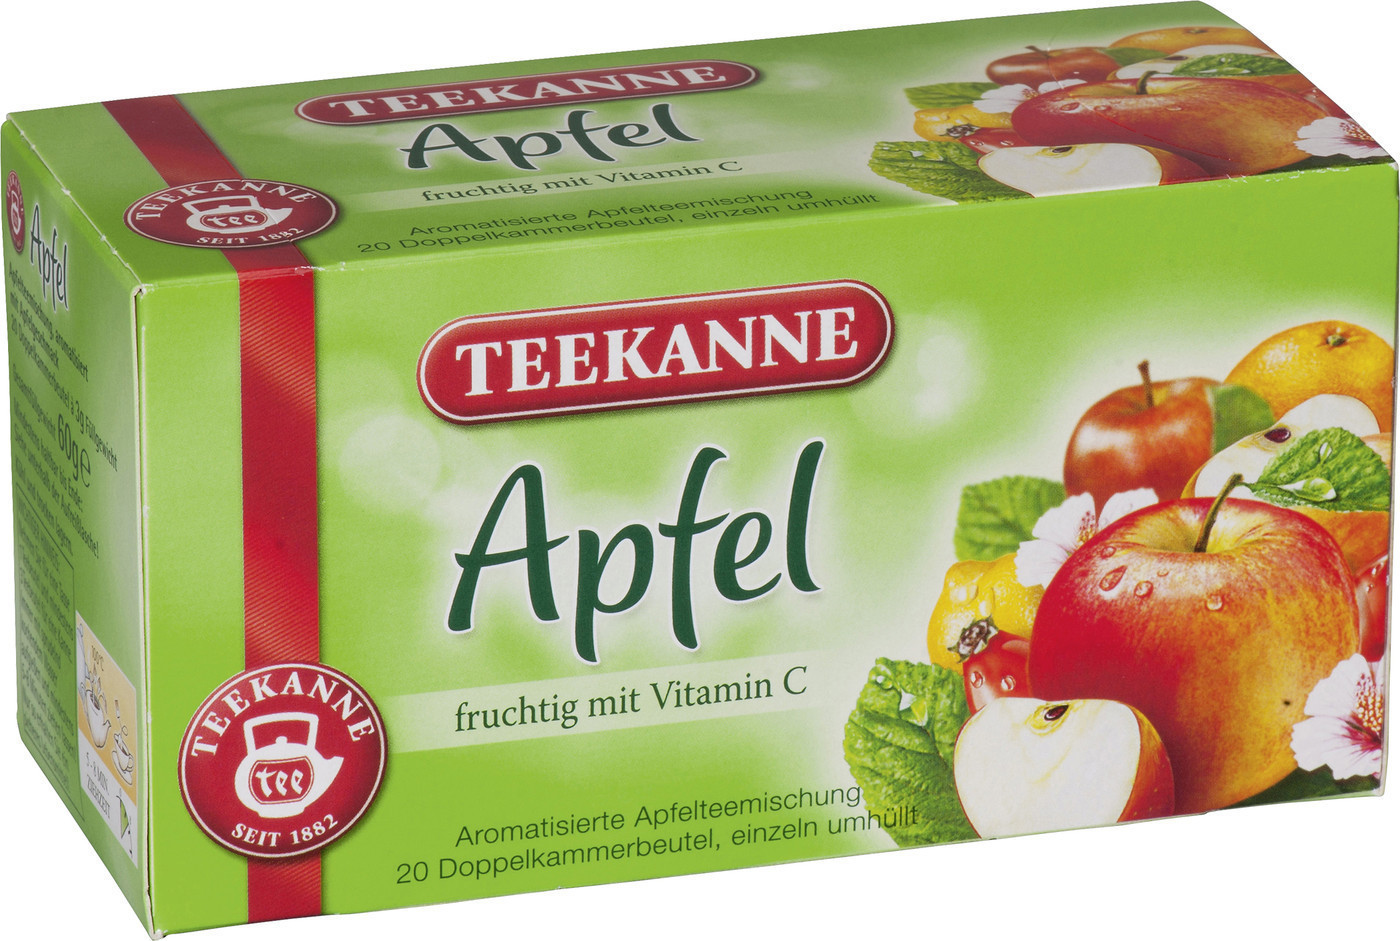 Teekanne Apfel (20 Stk.)